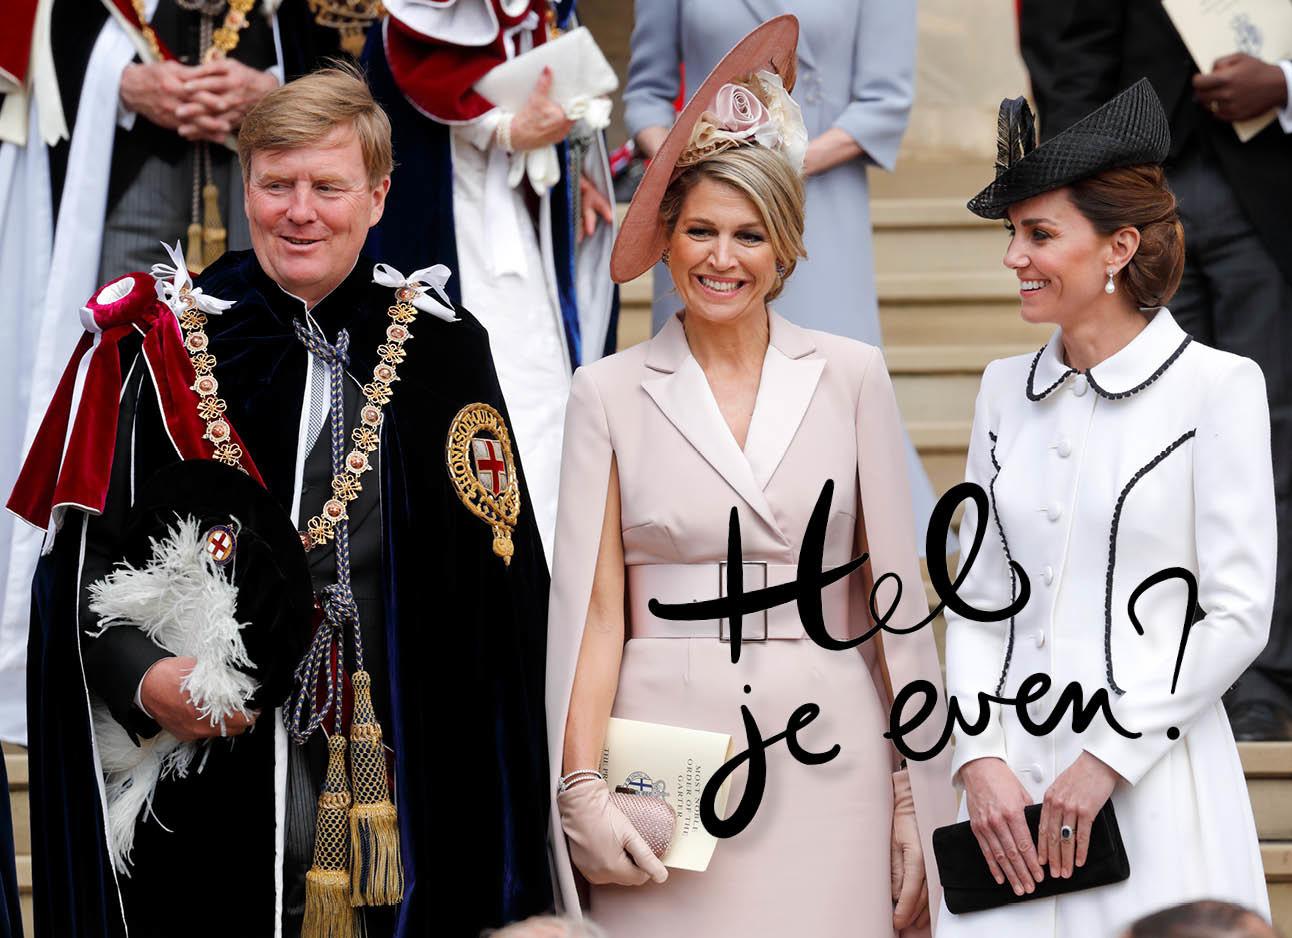 Koning willem-alexander, koningin Maxima en Kate Middleton